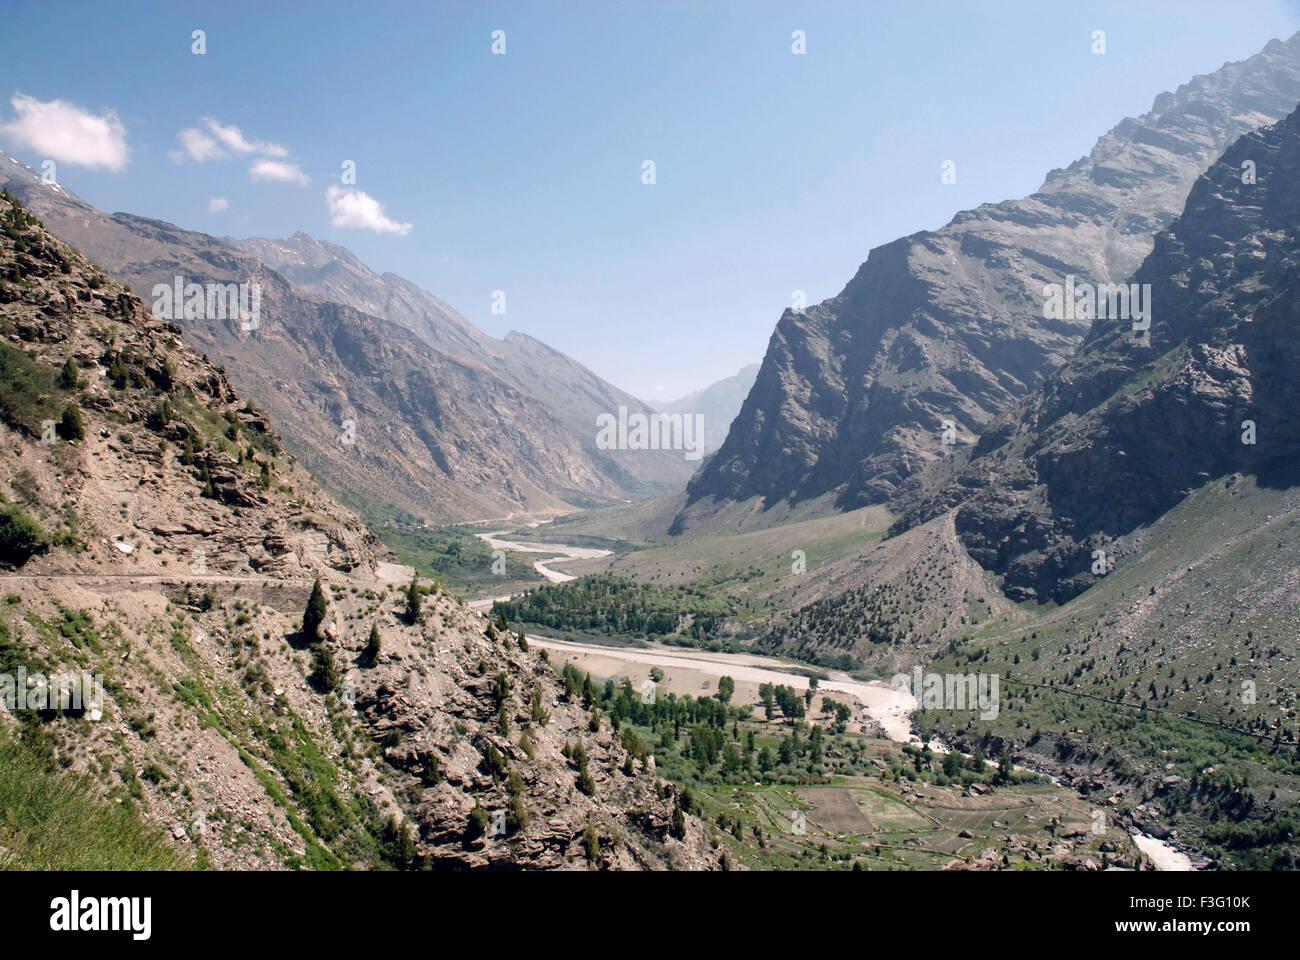 Bhaga river flowing in Bhaga valley ; Keylong ; Himachal Pradesh ; India - Stock Image